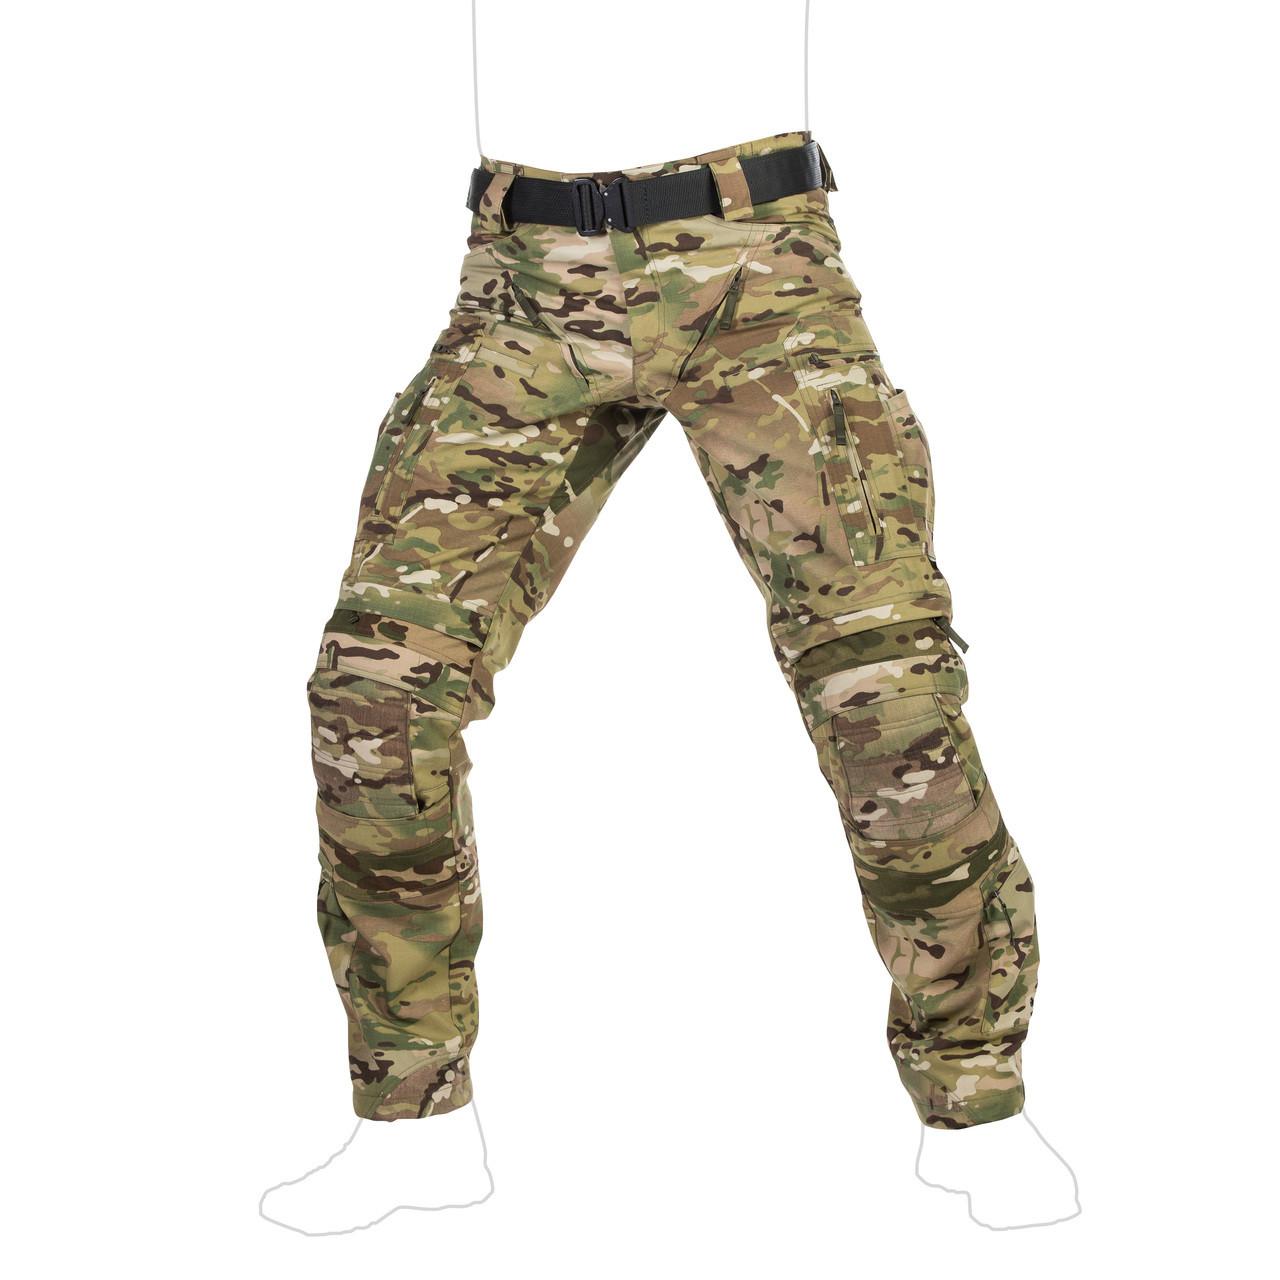 b3504378ef4c11 UF Pro Striker HT Combat Pants Multicam - Cool Kit Australia